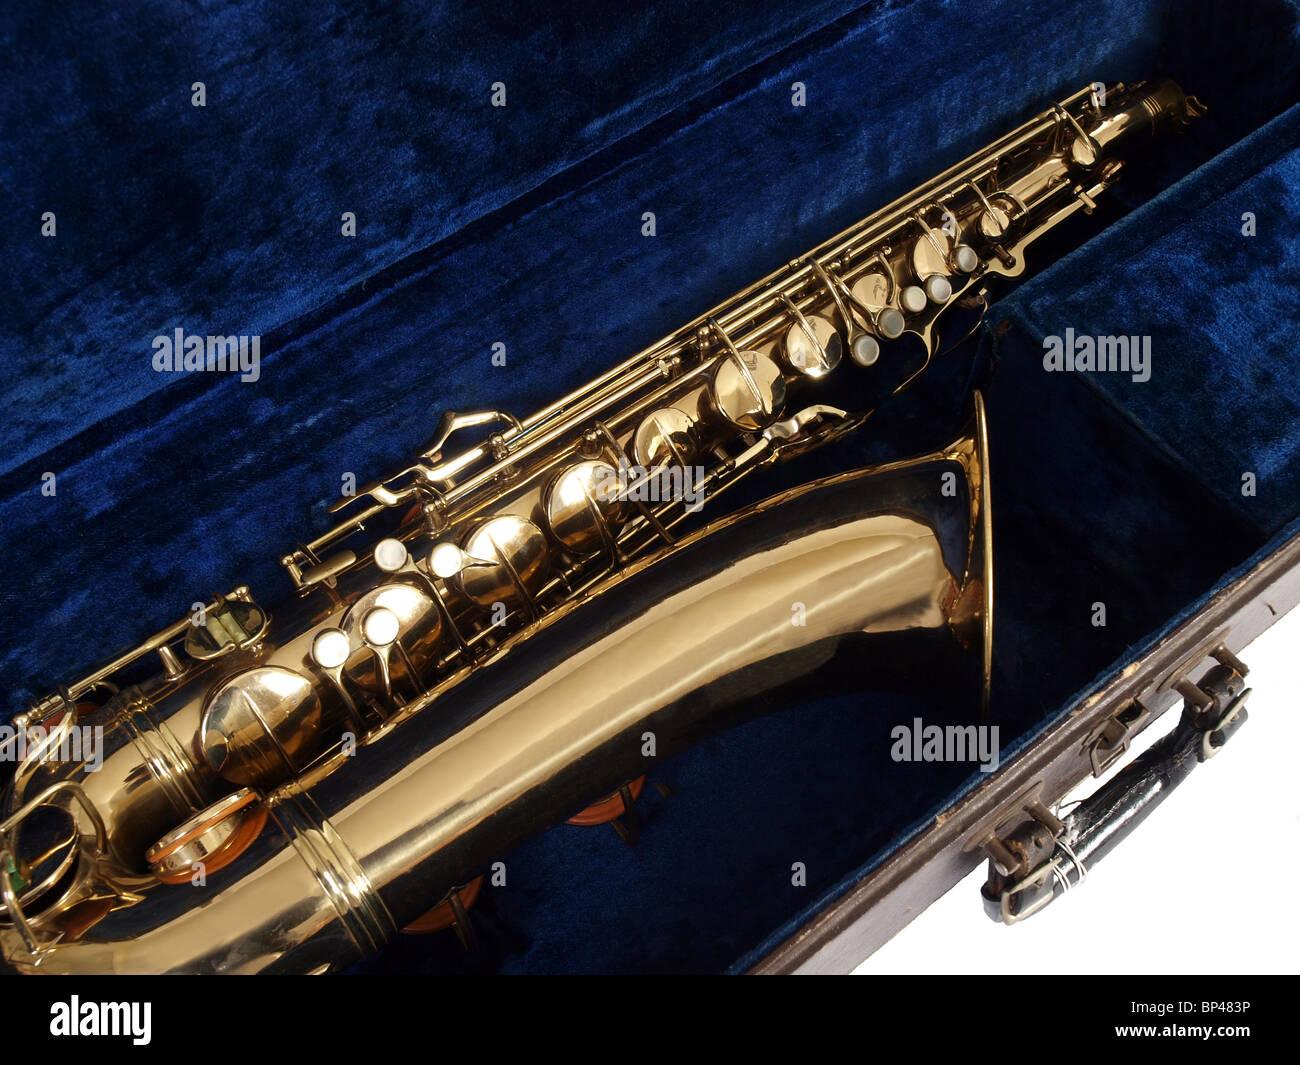 Vintage saxophone in it's original travel case. - Stock Image